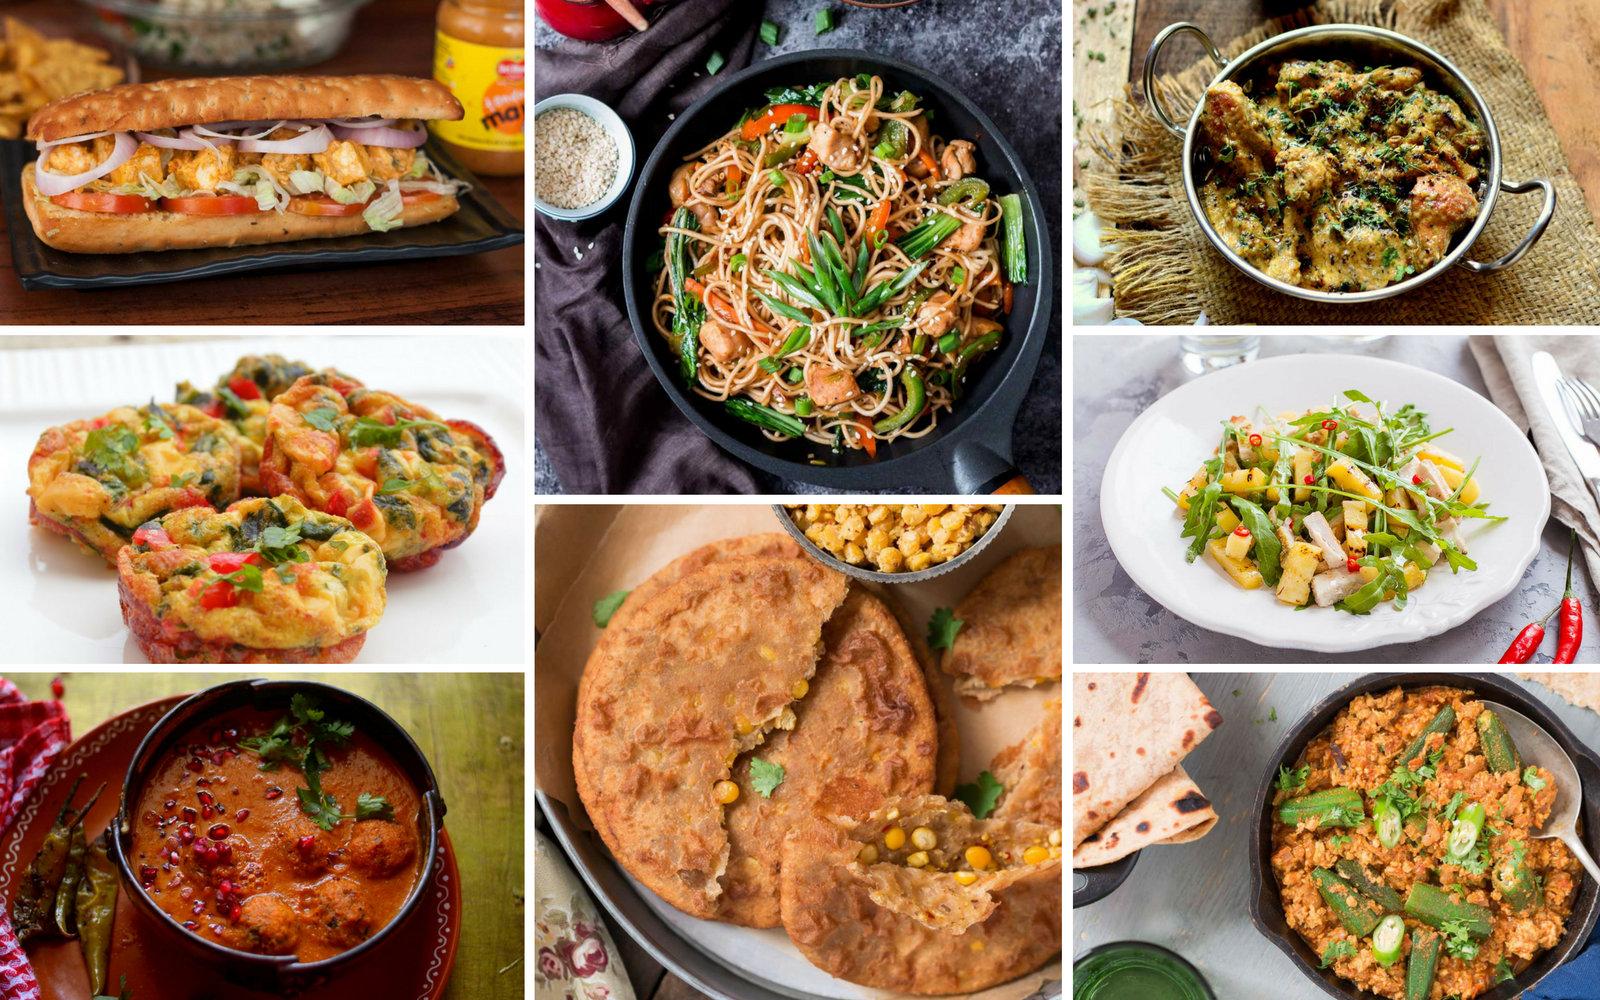 The 40 Best Recipes Of 2016 - Archana s Kitchen by Archana s Kitchen 8809a63e76